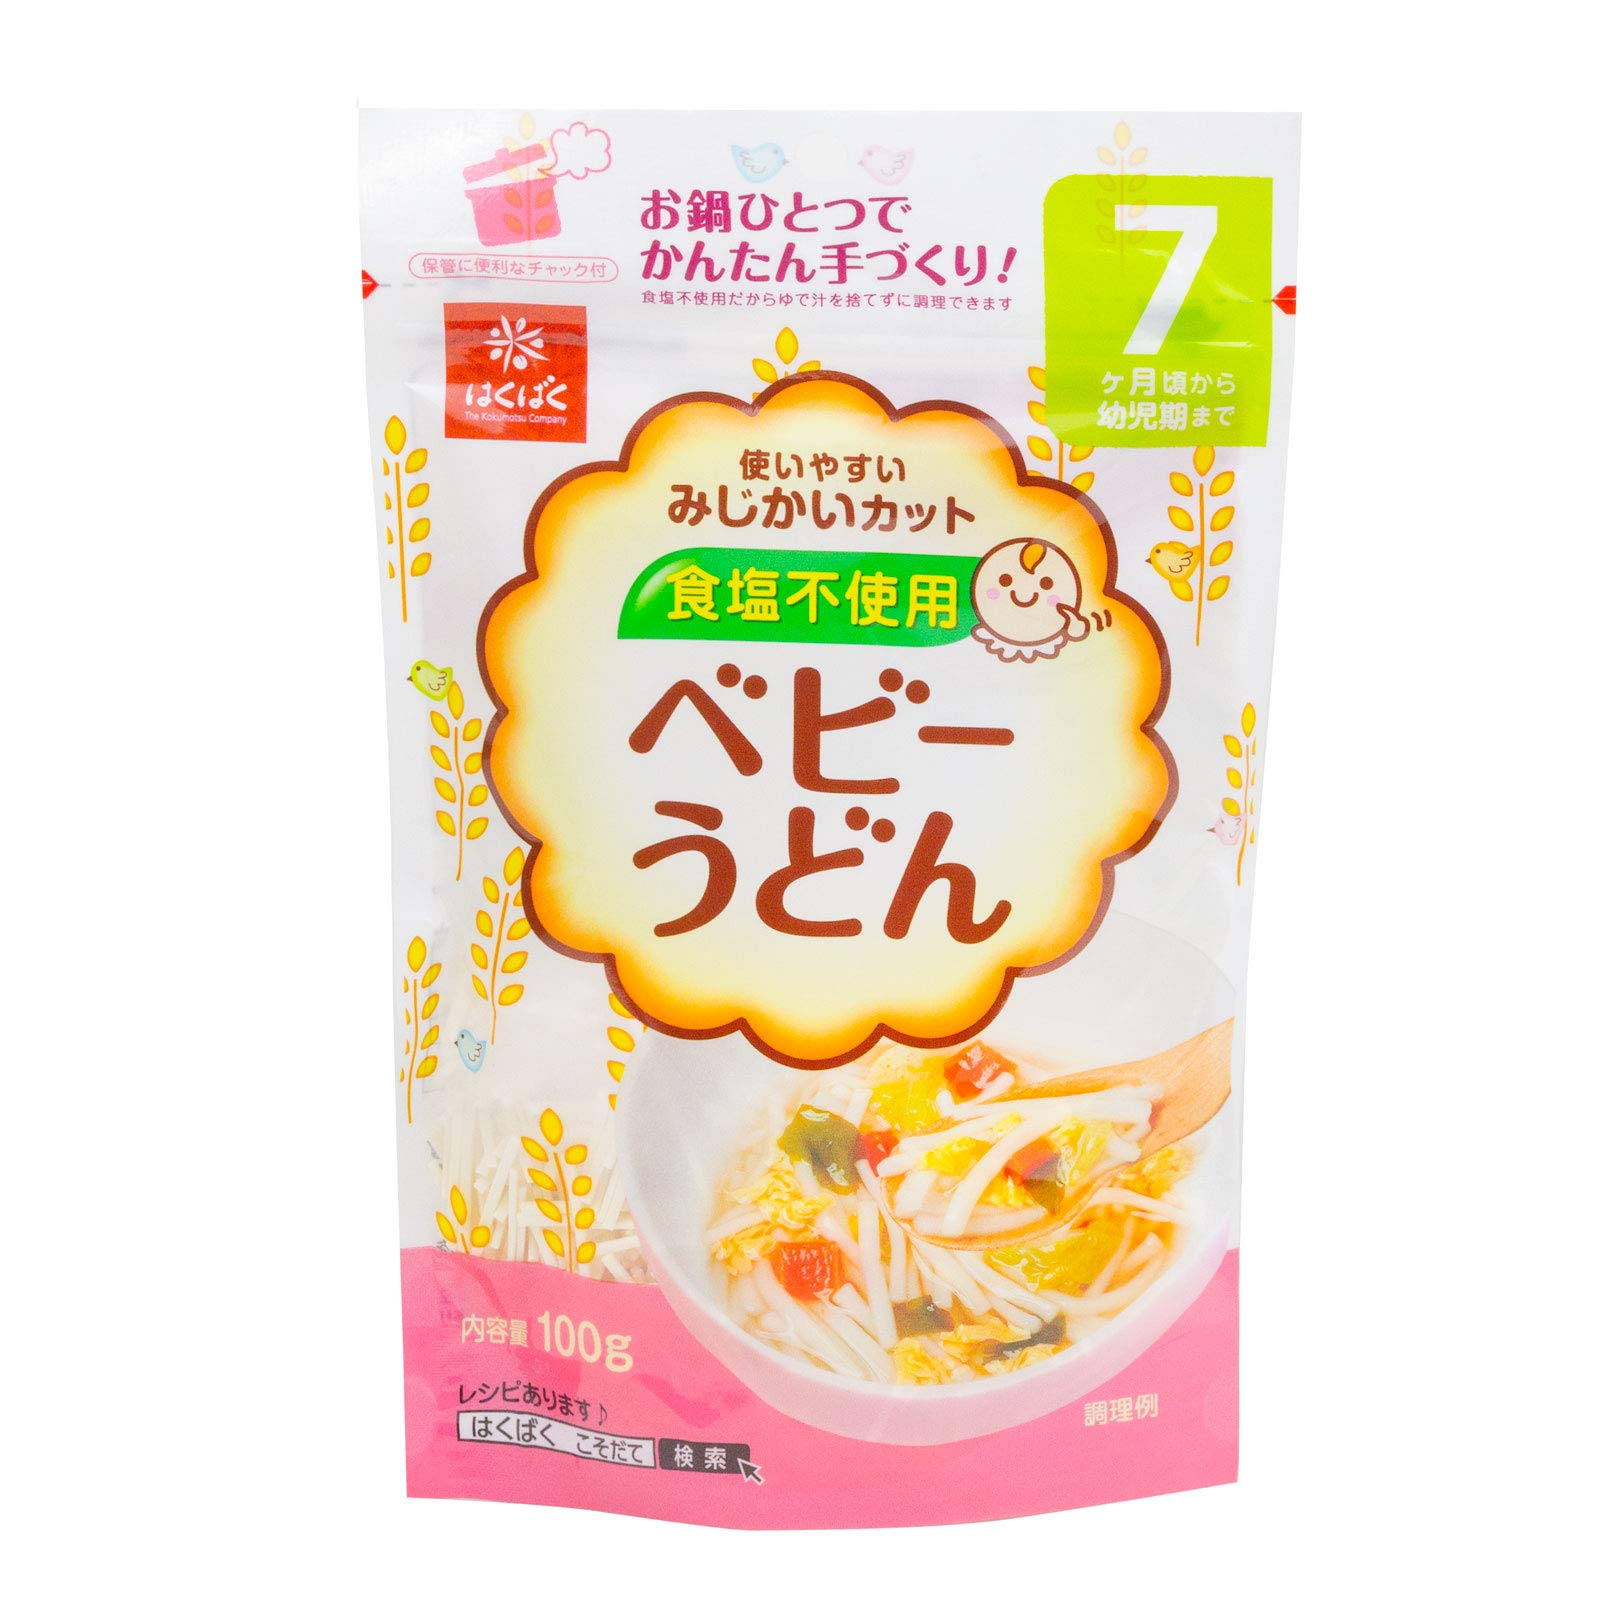 Hakubaku Baby Safe Udon Noodles 100g x 4pack by HAKUBAKU THE KOKUMOTSU COMPANY